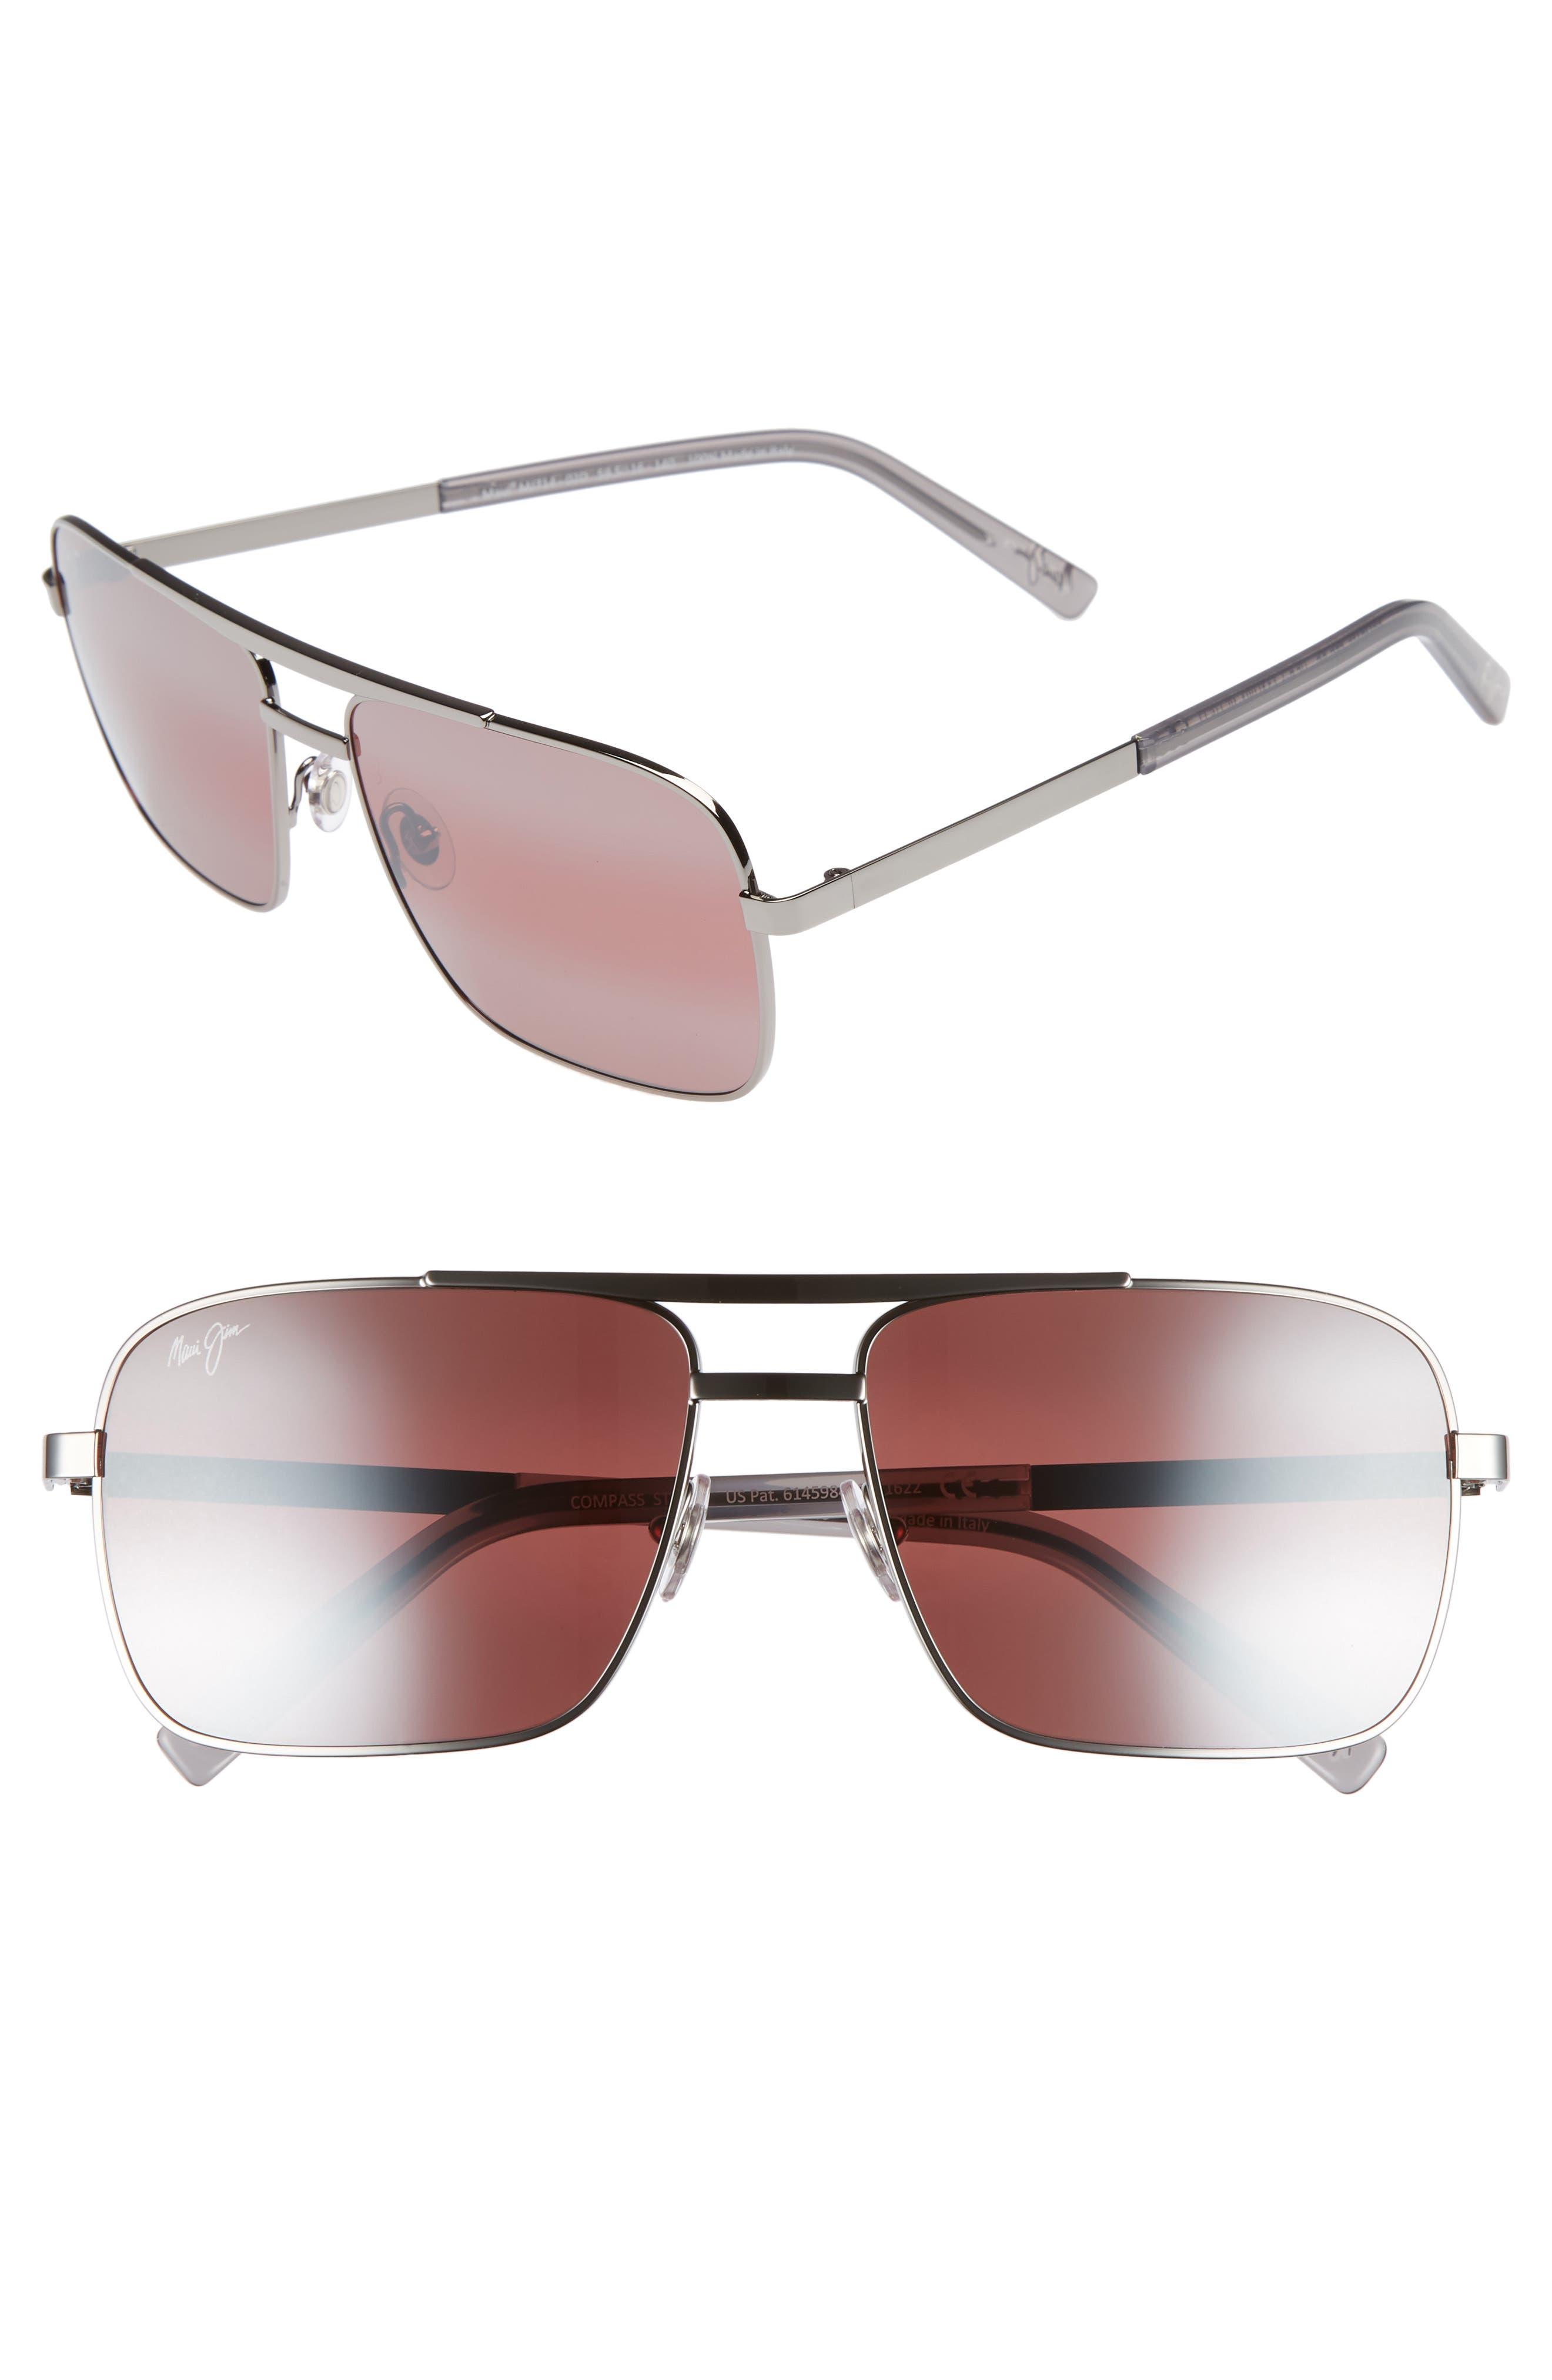 Compass 60mm Polarized Aviator Sunglasses,                             Main thumbnail 1, color,                             GUNMETAL/ MAUI ROSE